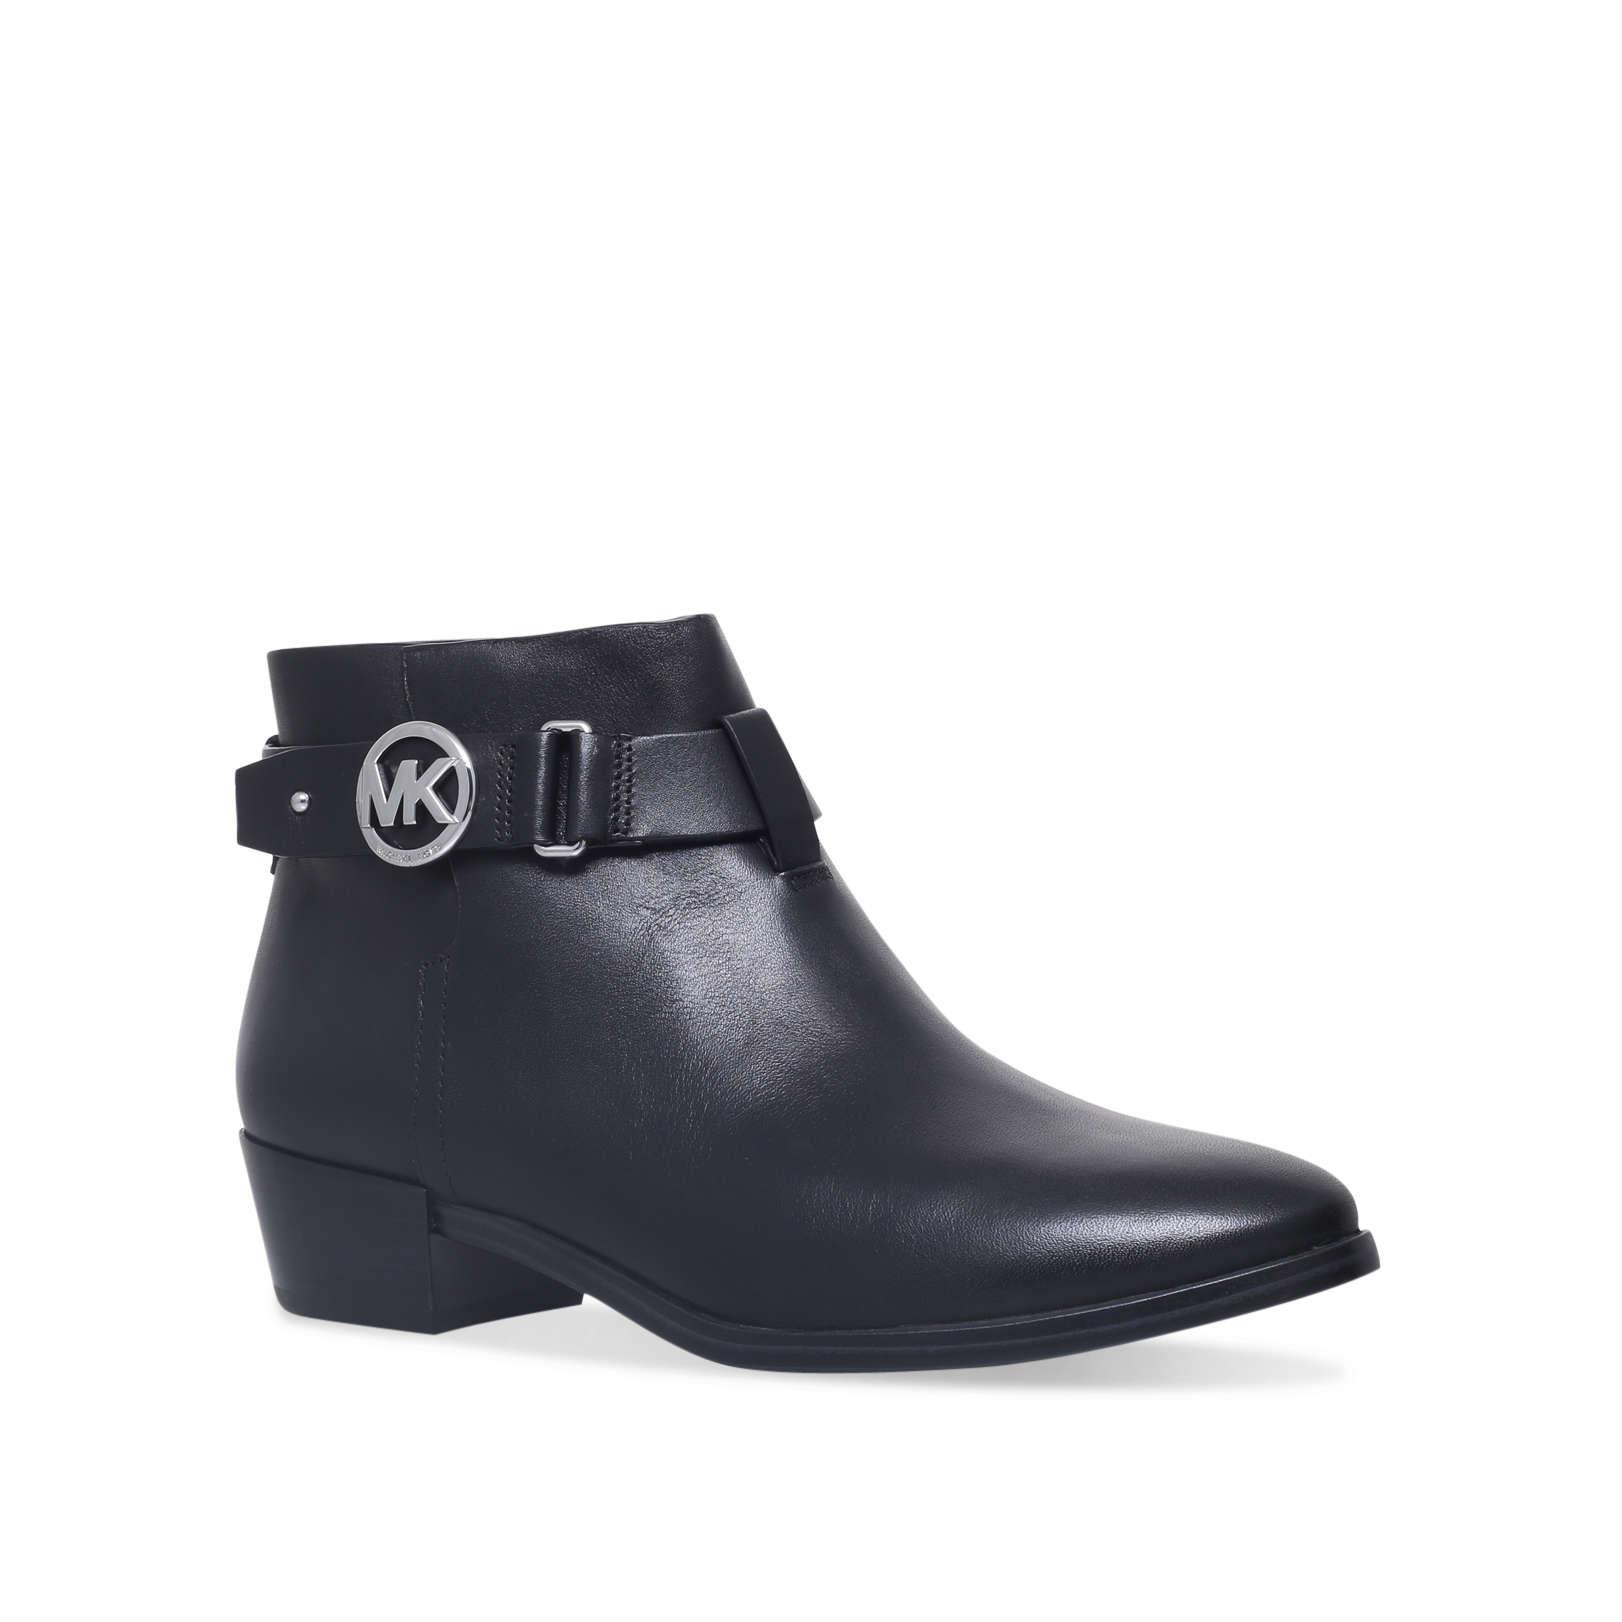 3f61b7820c3a HARLAND BOOTIE  Michael Michael Kors Harland Bootie Black Leather Ankle Boot   by MICHAEL MICHAEL KORS